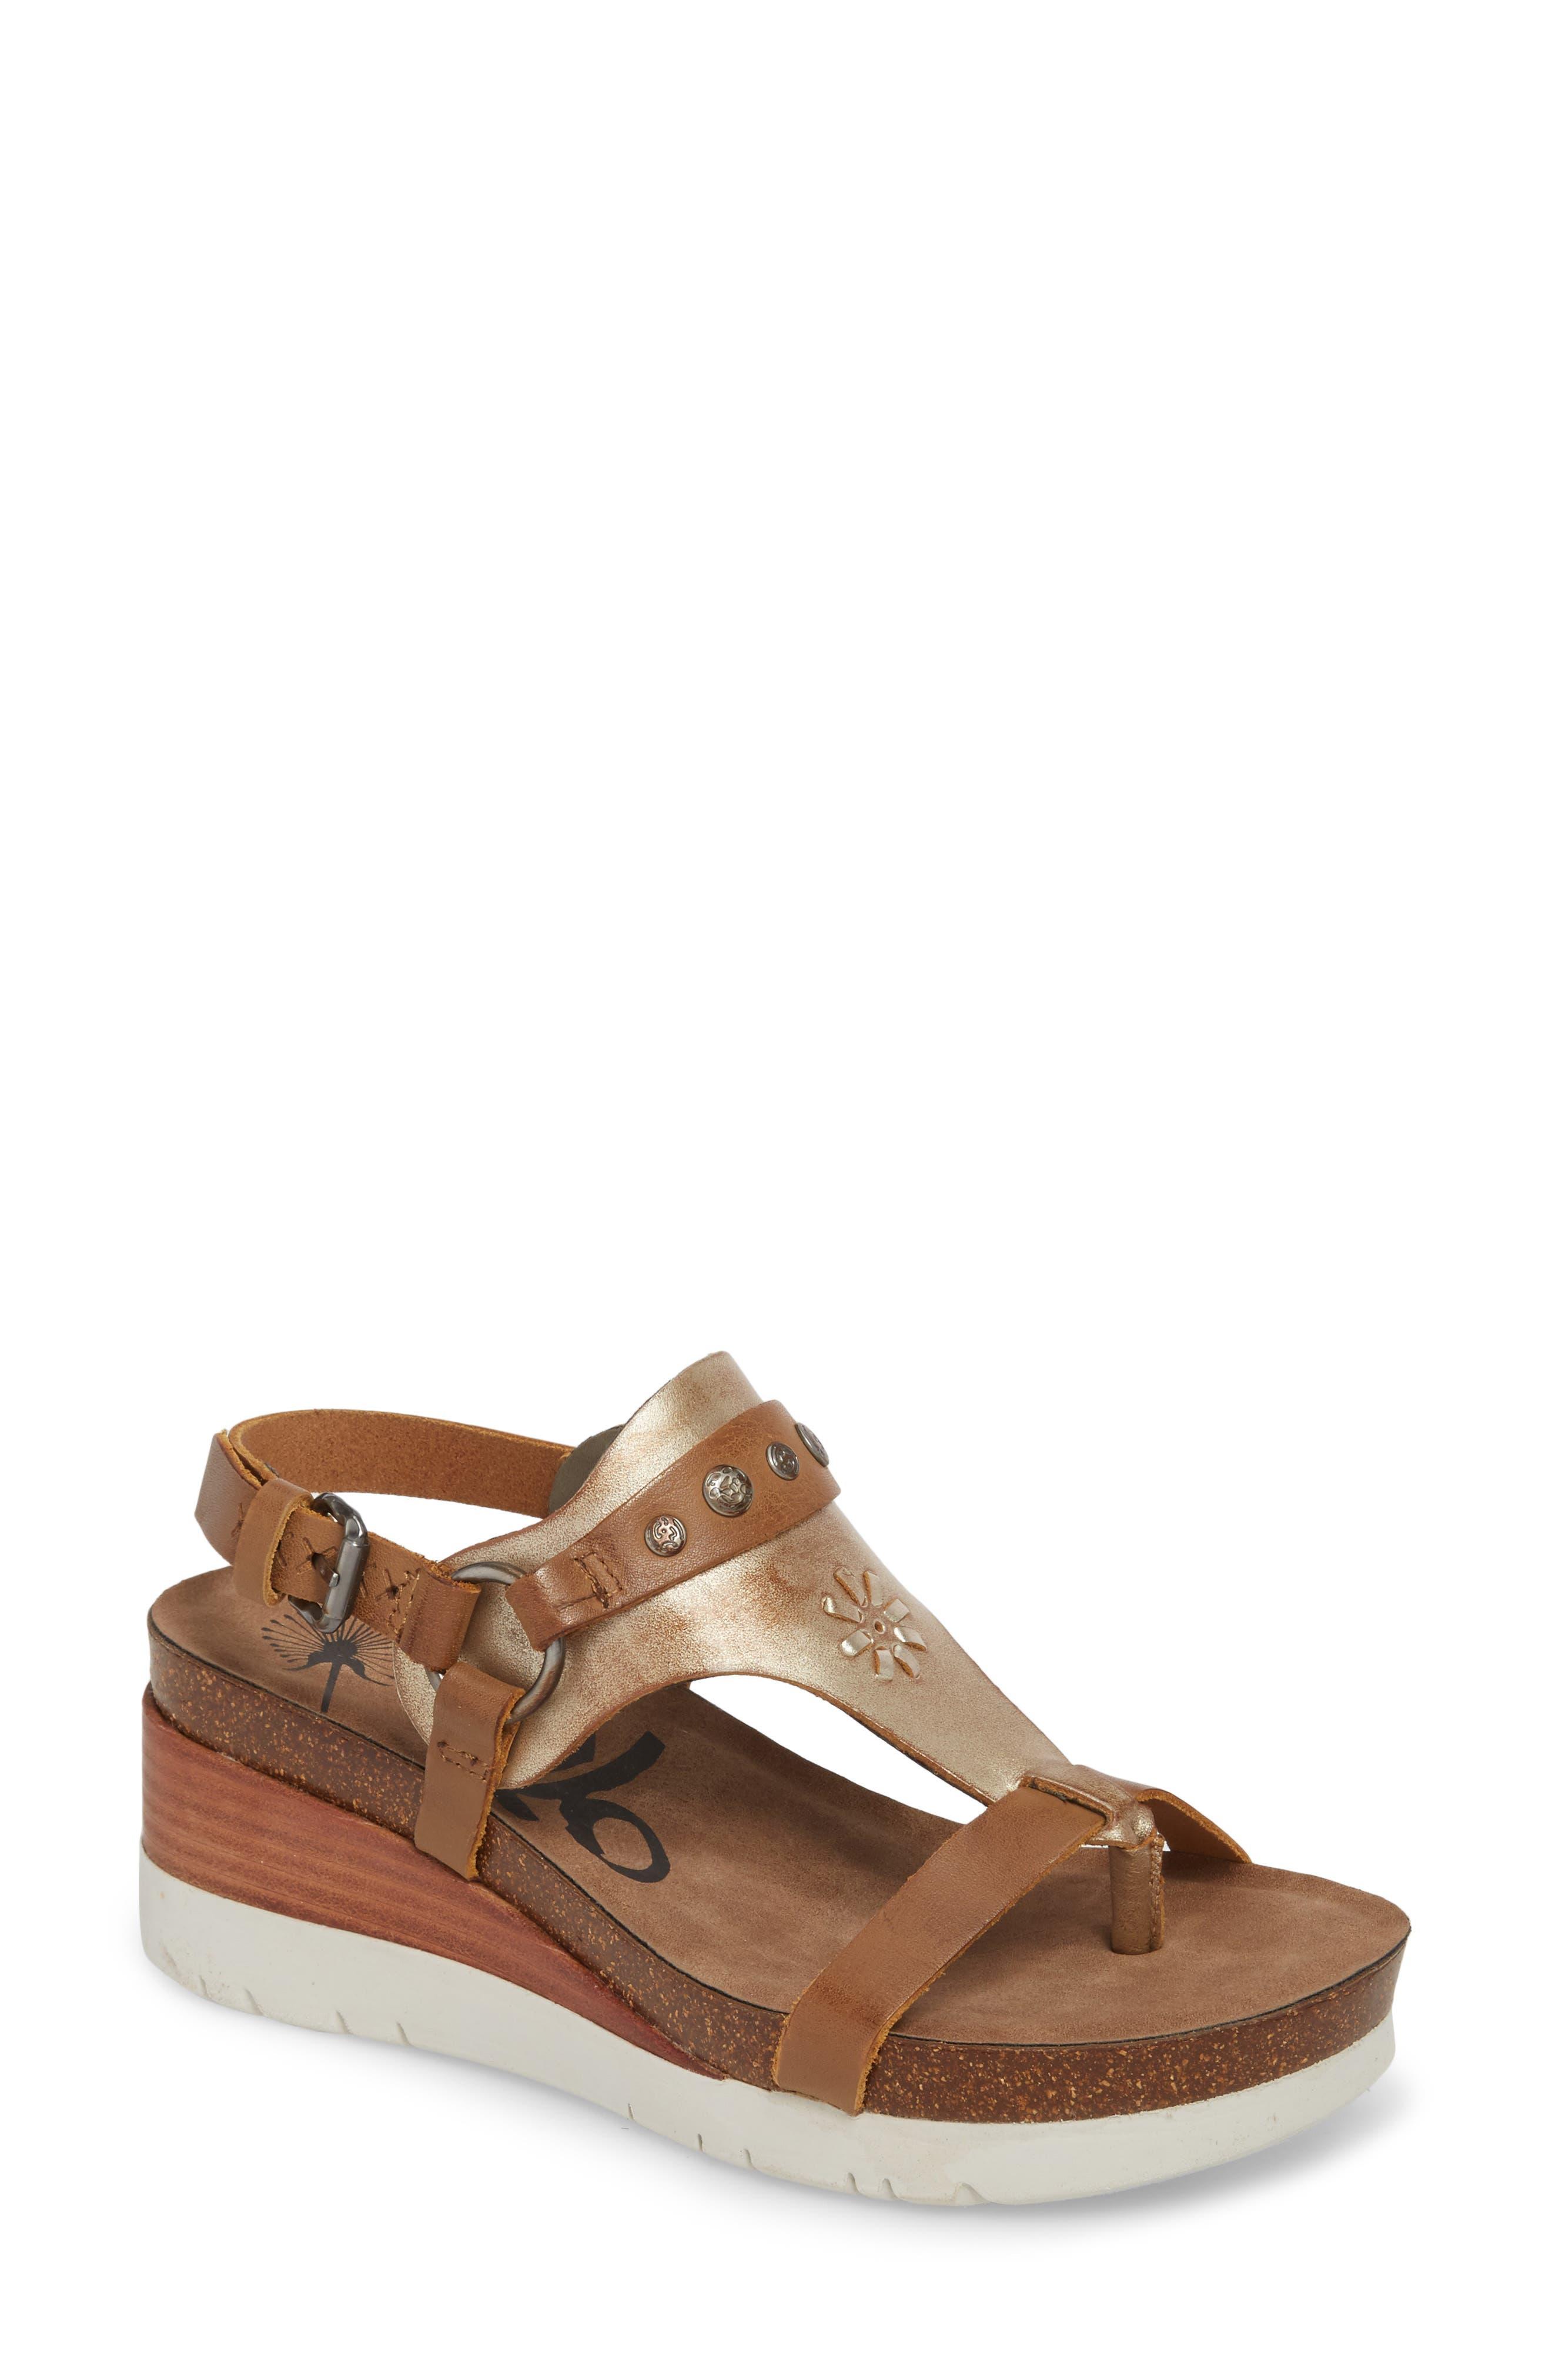 Maverick Wedge Sandal,                         Main,                         color, New Taupe Leather